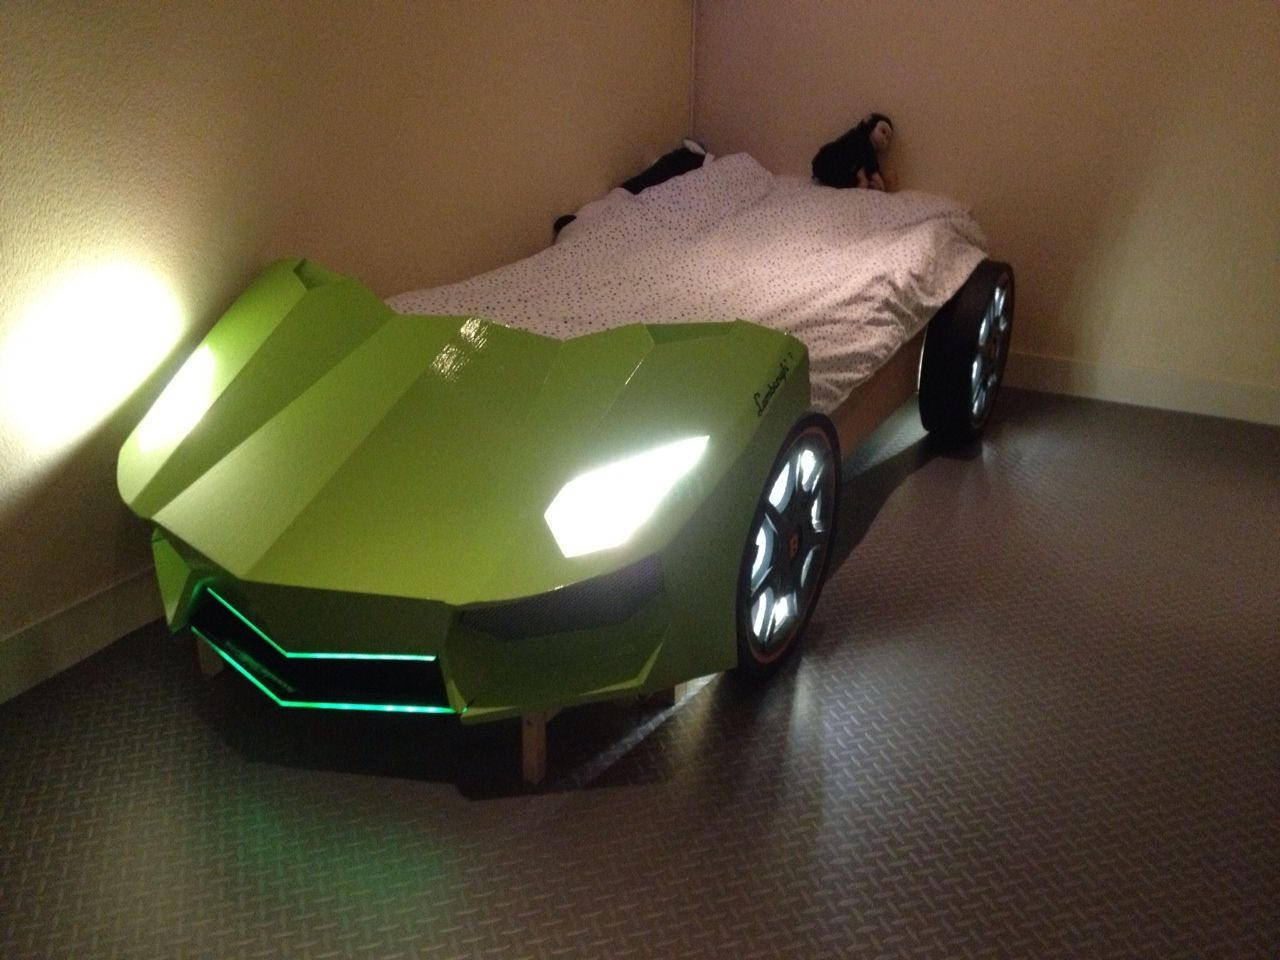 Auto Kinderbed Lamborghini Bed Autobed Kinderbed